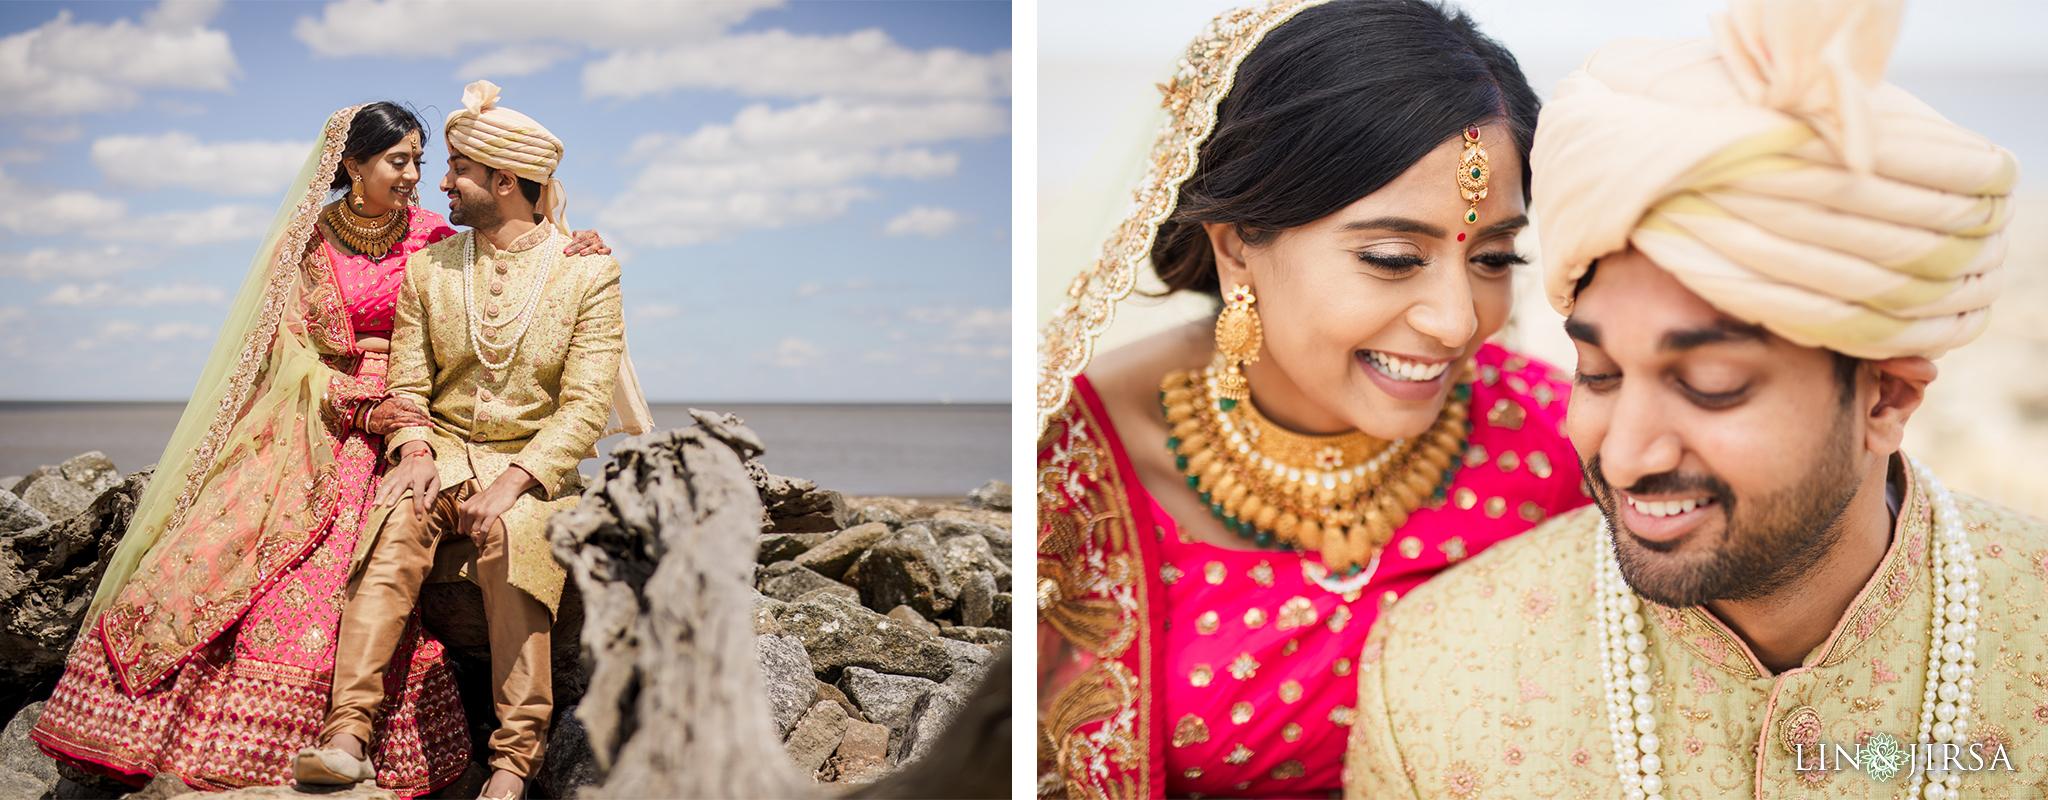 42 Driftwood Beach Jekyll Island Georgia Indian Wedding Photography